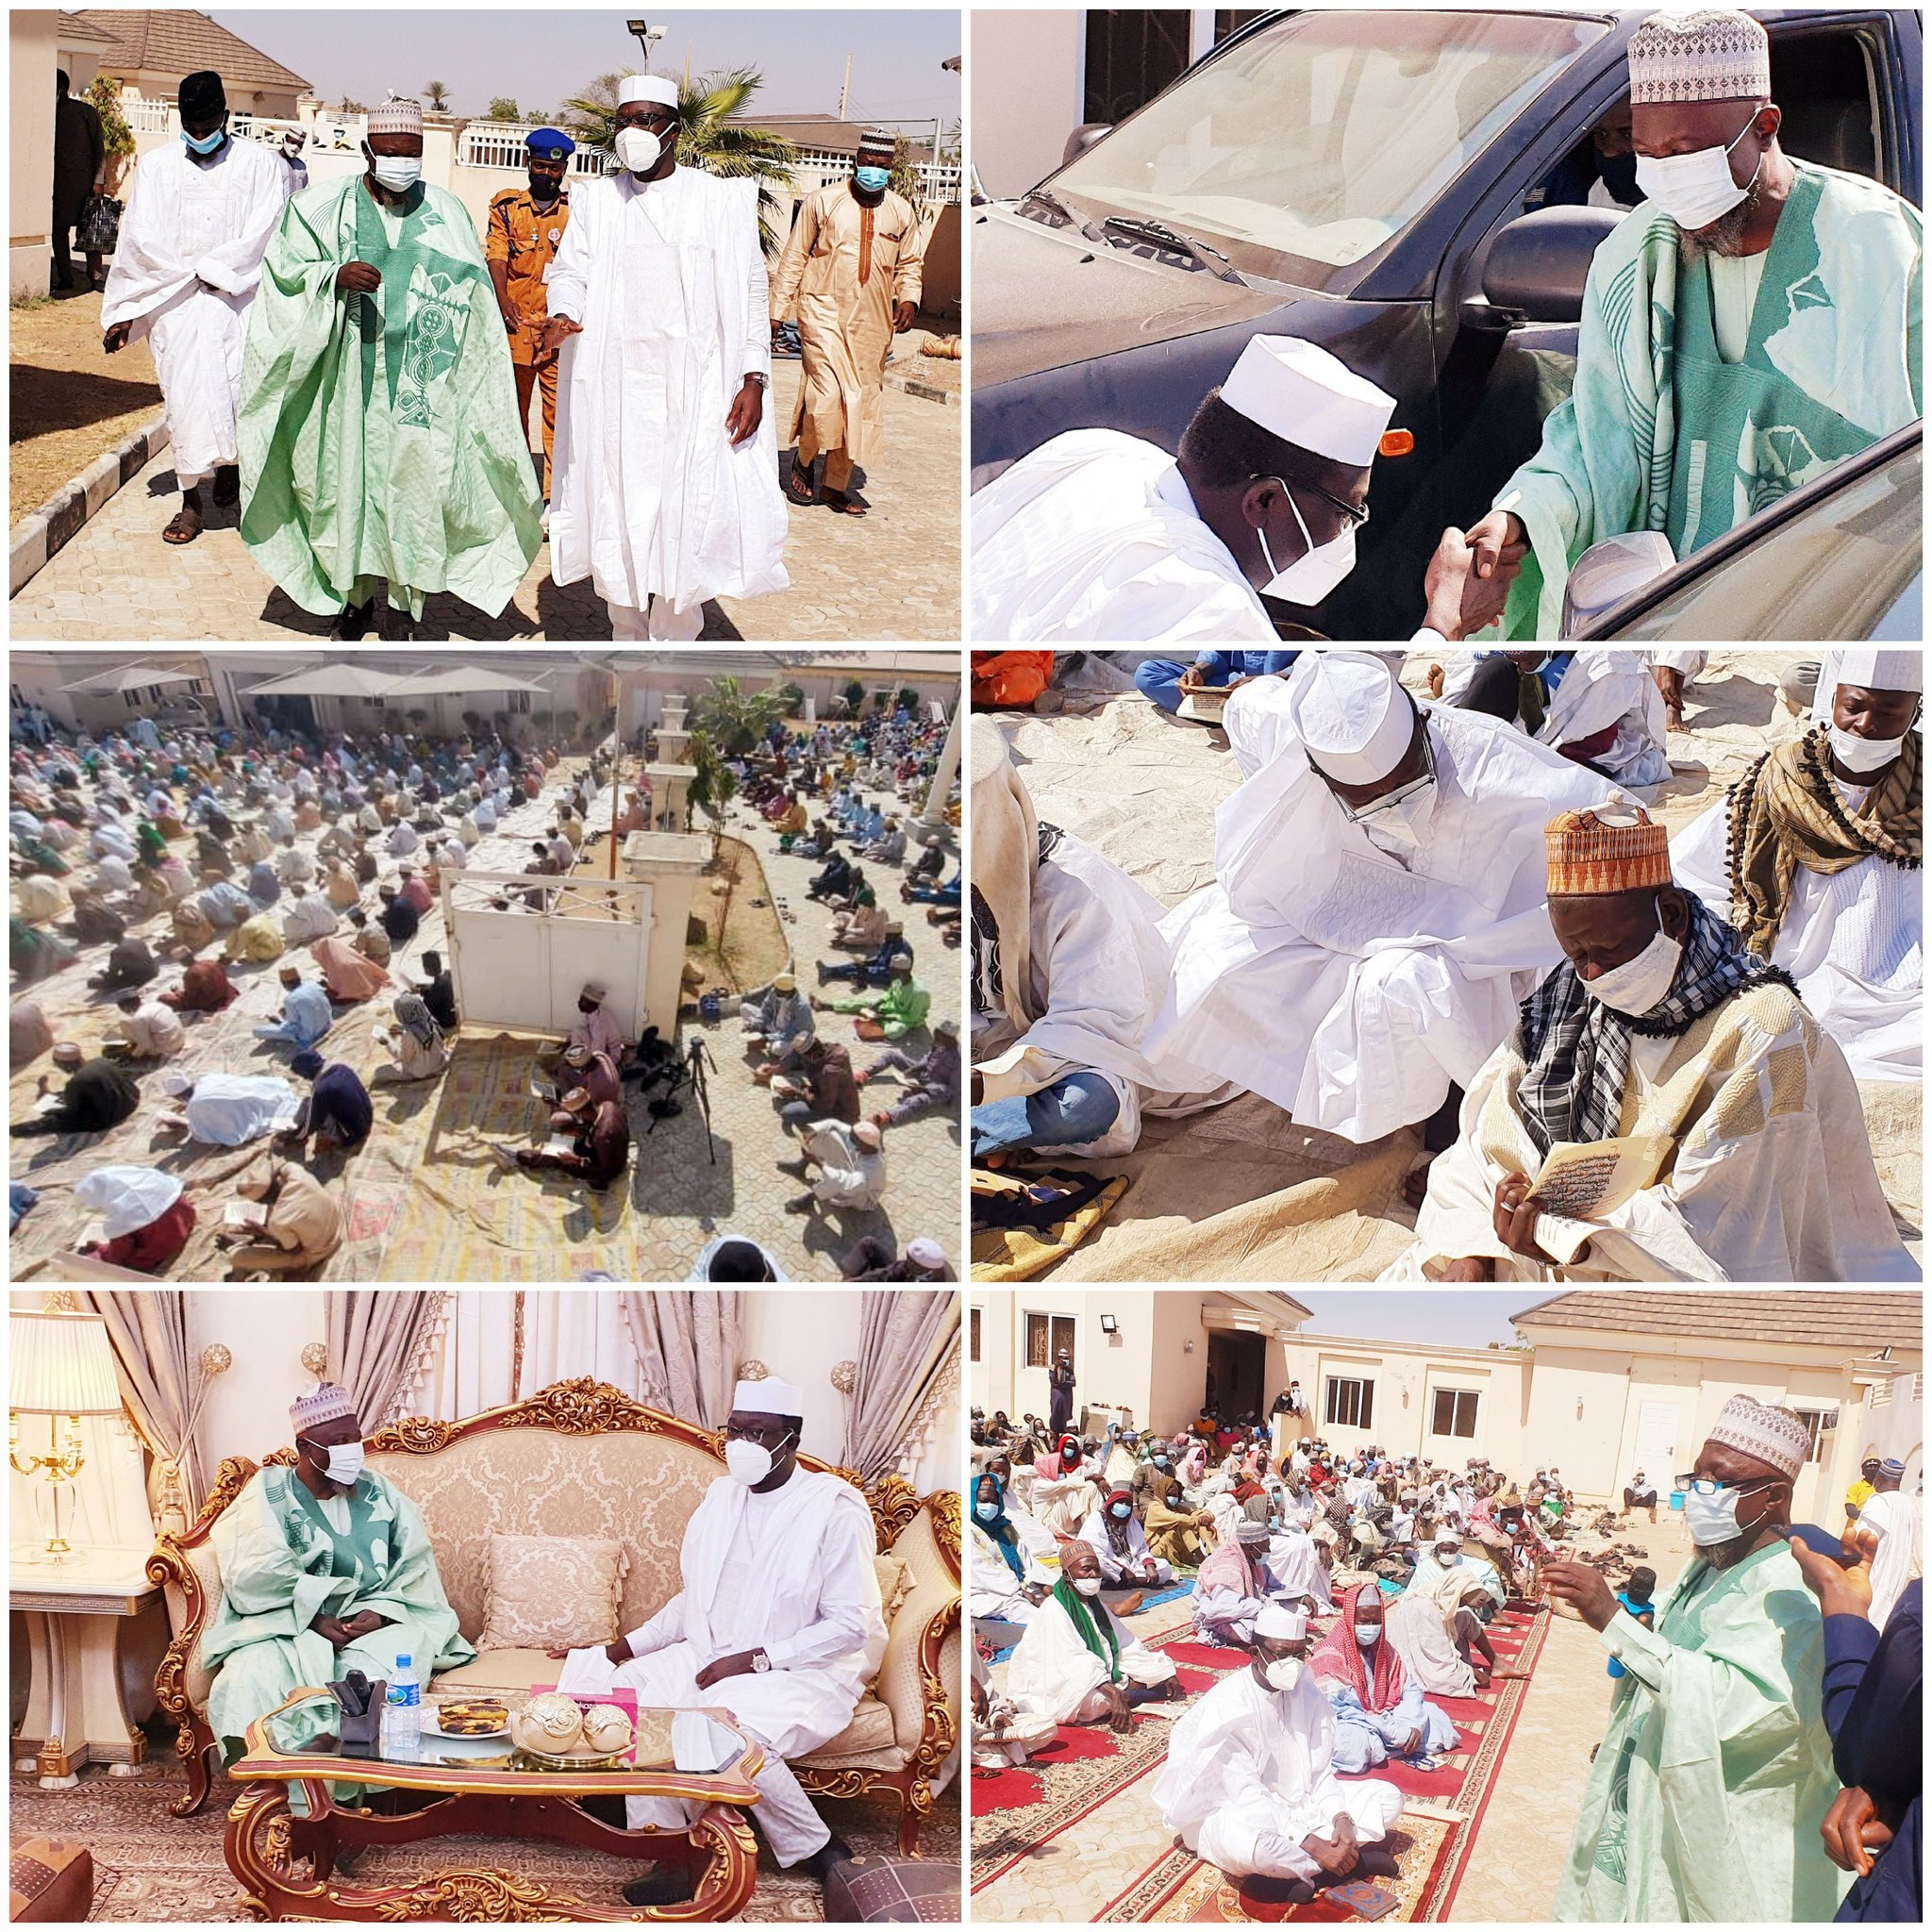 EskX9OiXAAEm8Y1 - Insecurity: 1000 Imams Gather In Kano To Pray For Buhari, Nigeria (Photos)